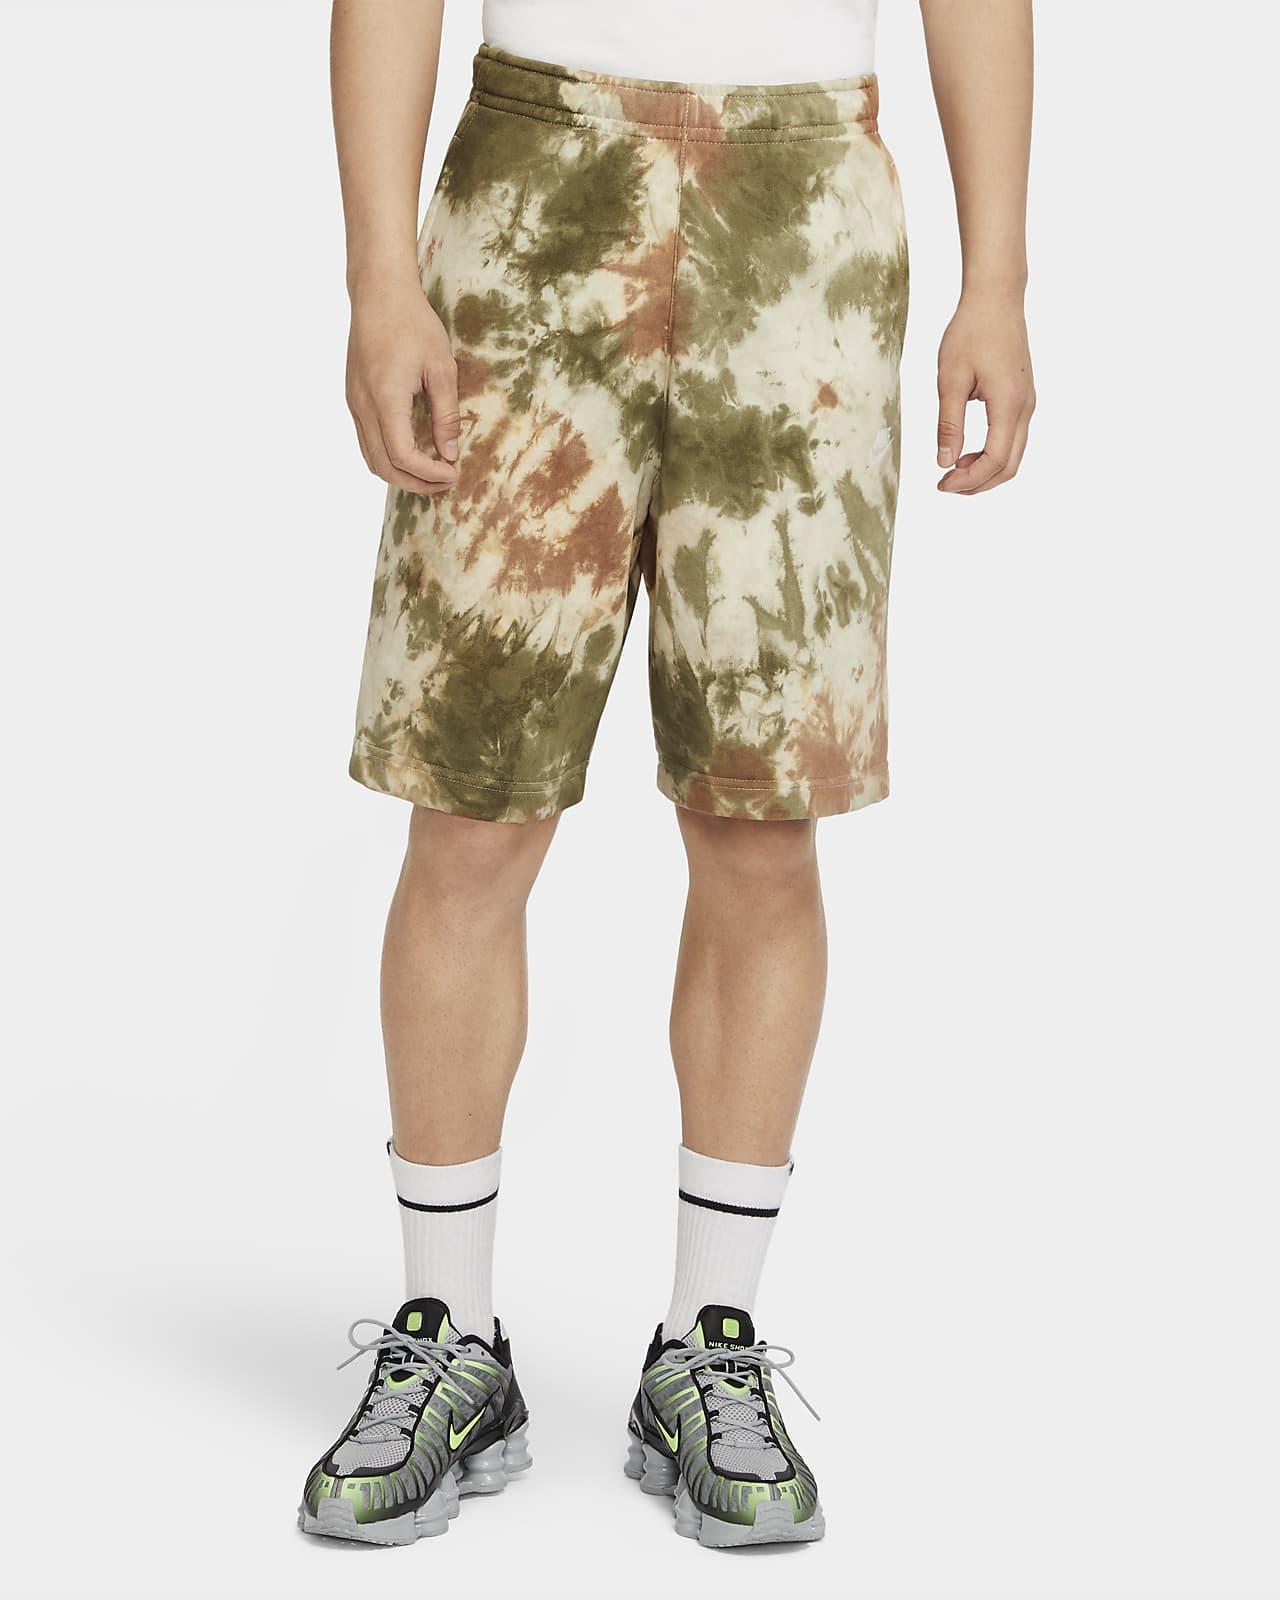 Мужские шорты из ткани френч терри Nike Sportswear